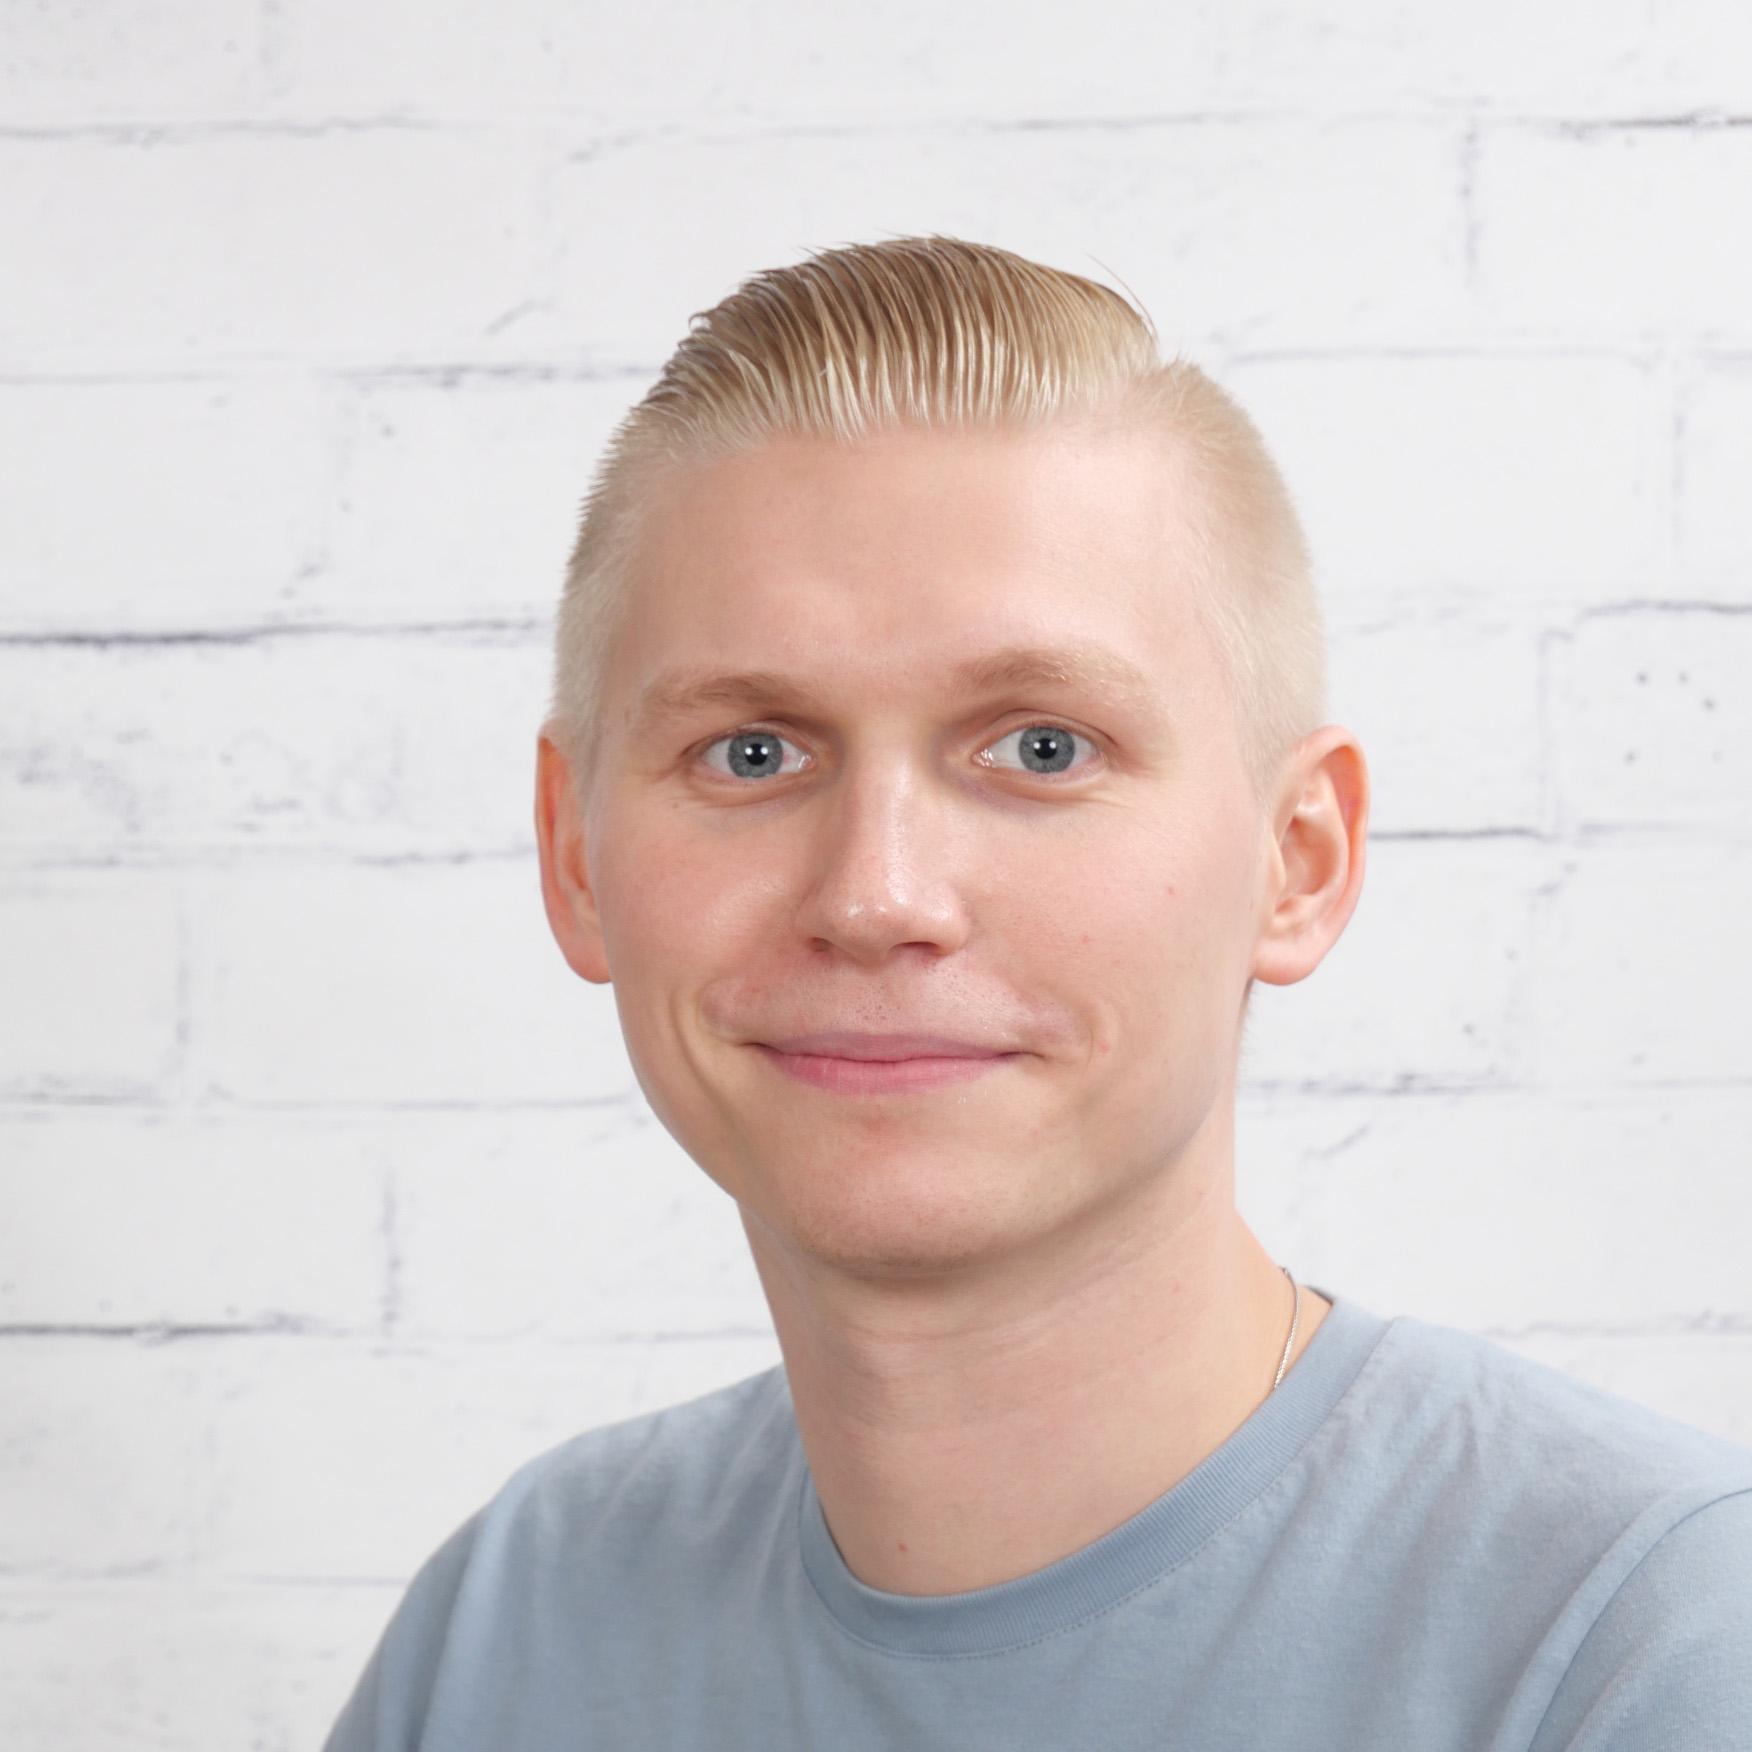 Profilbild von Niklas Kamp